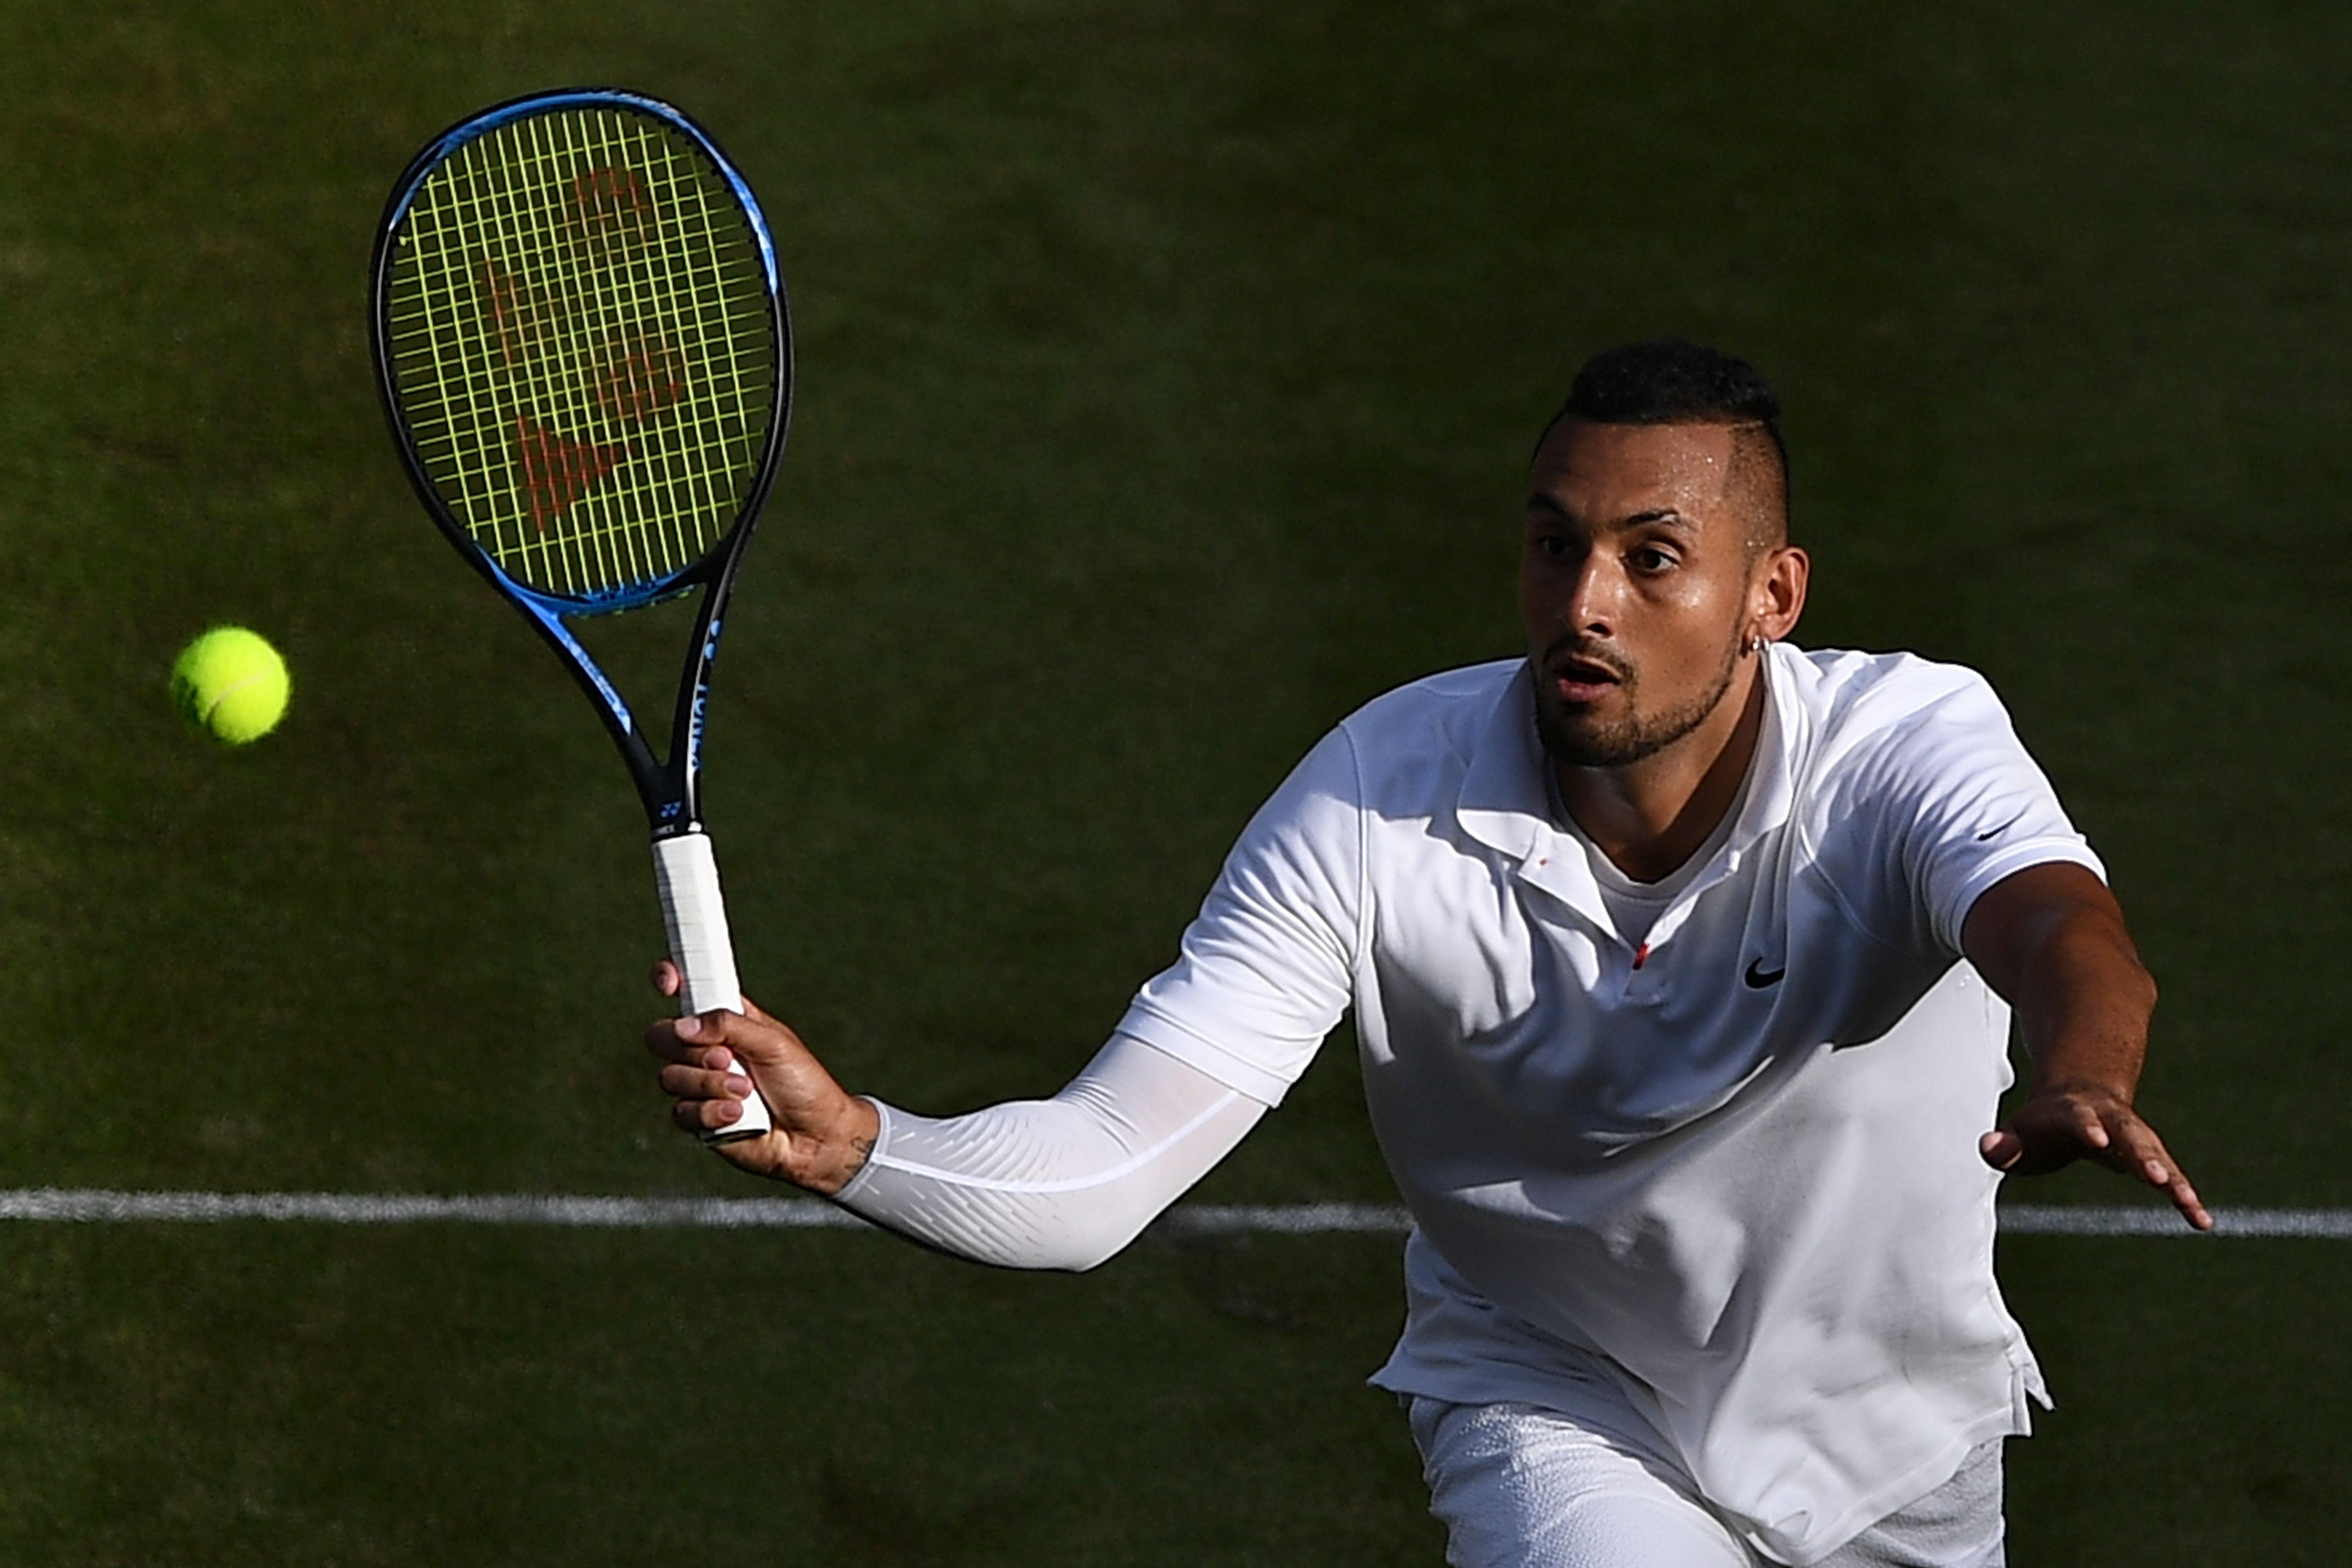 Kyrgios na derrota para Nadal em Wimbledon